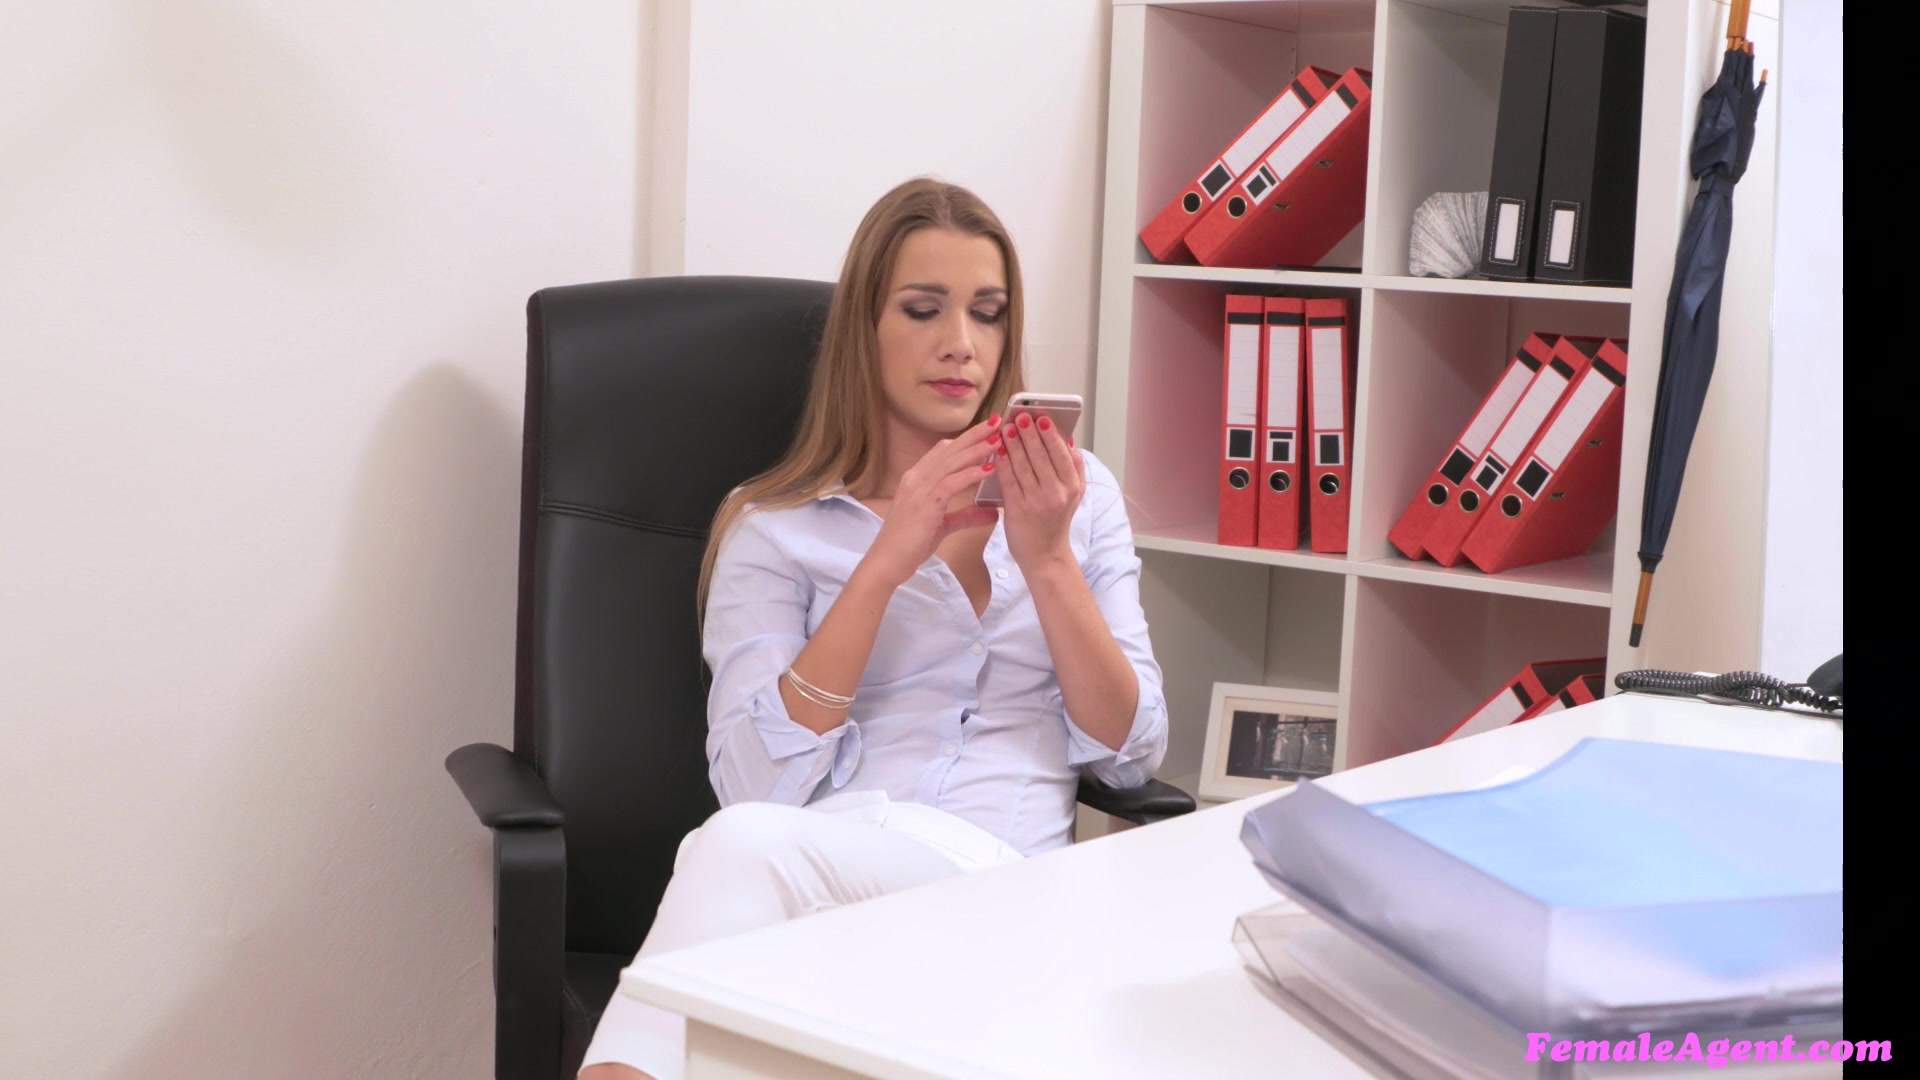 Czech Female Agent Lesbian